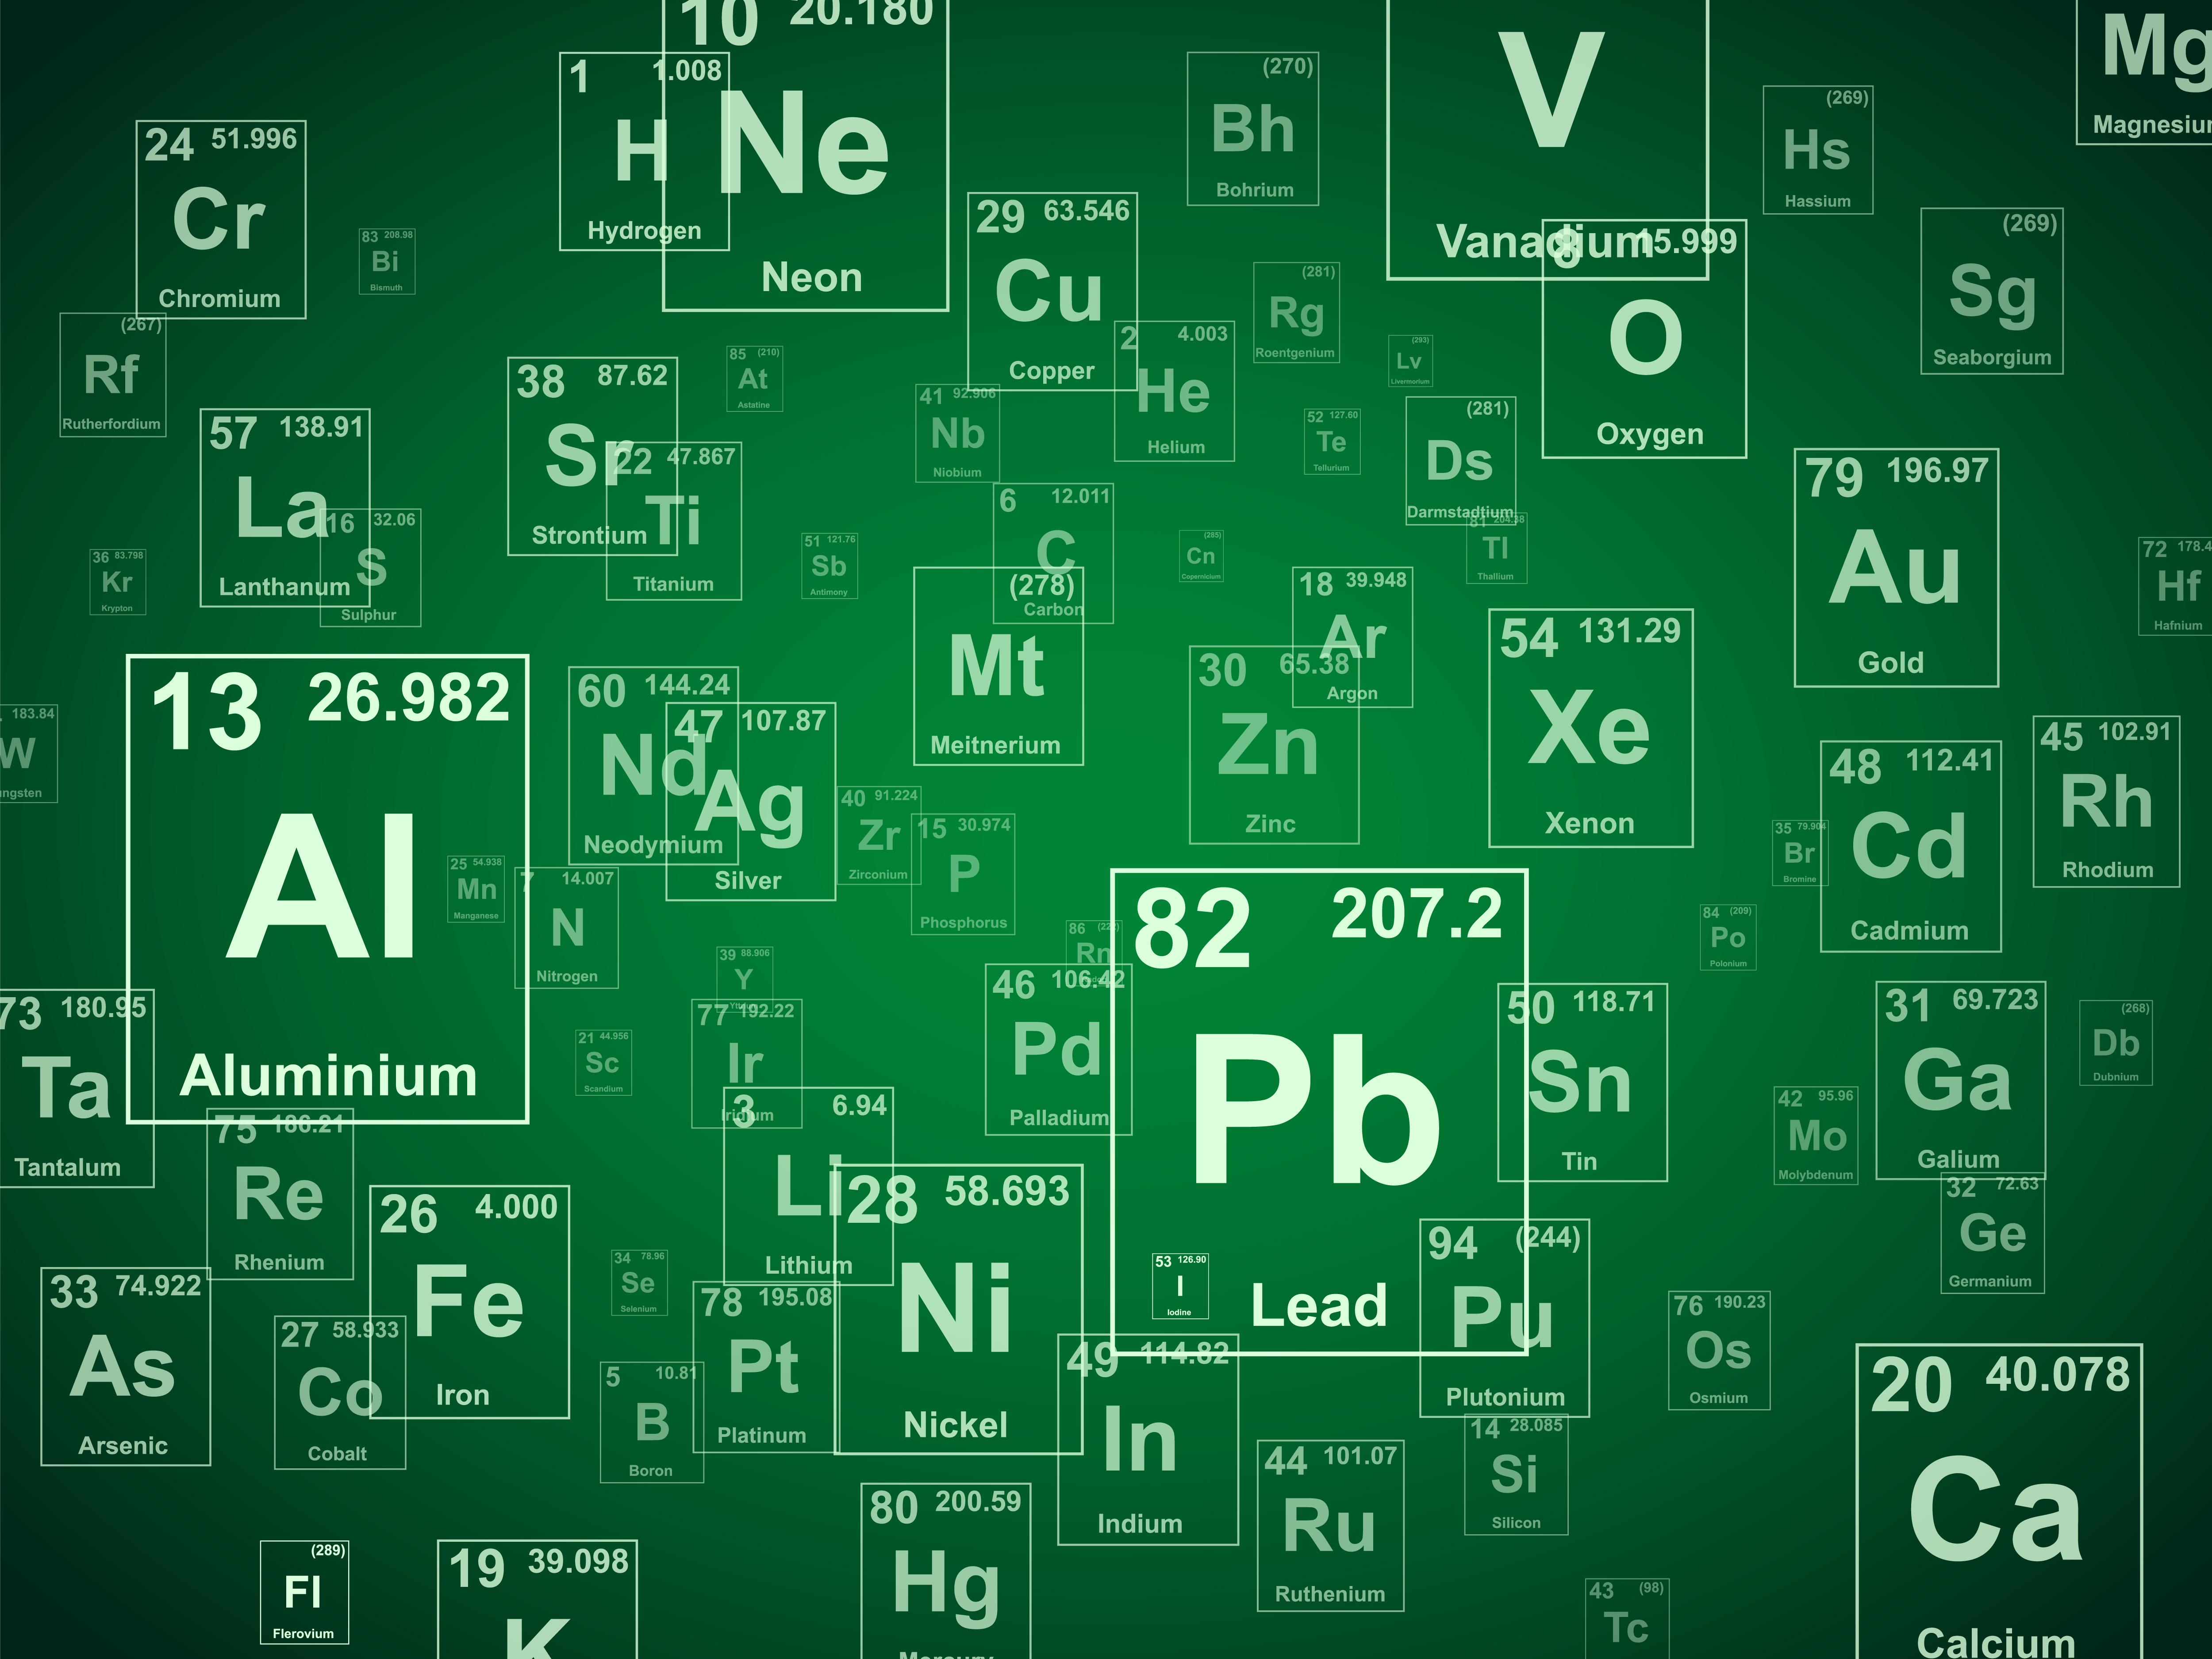 Elements #10